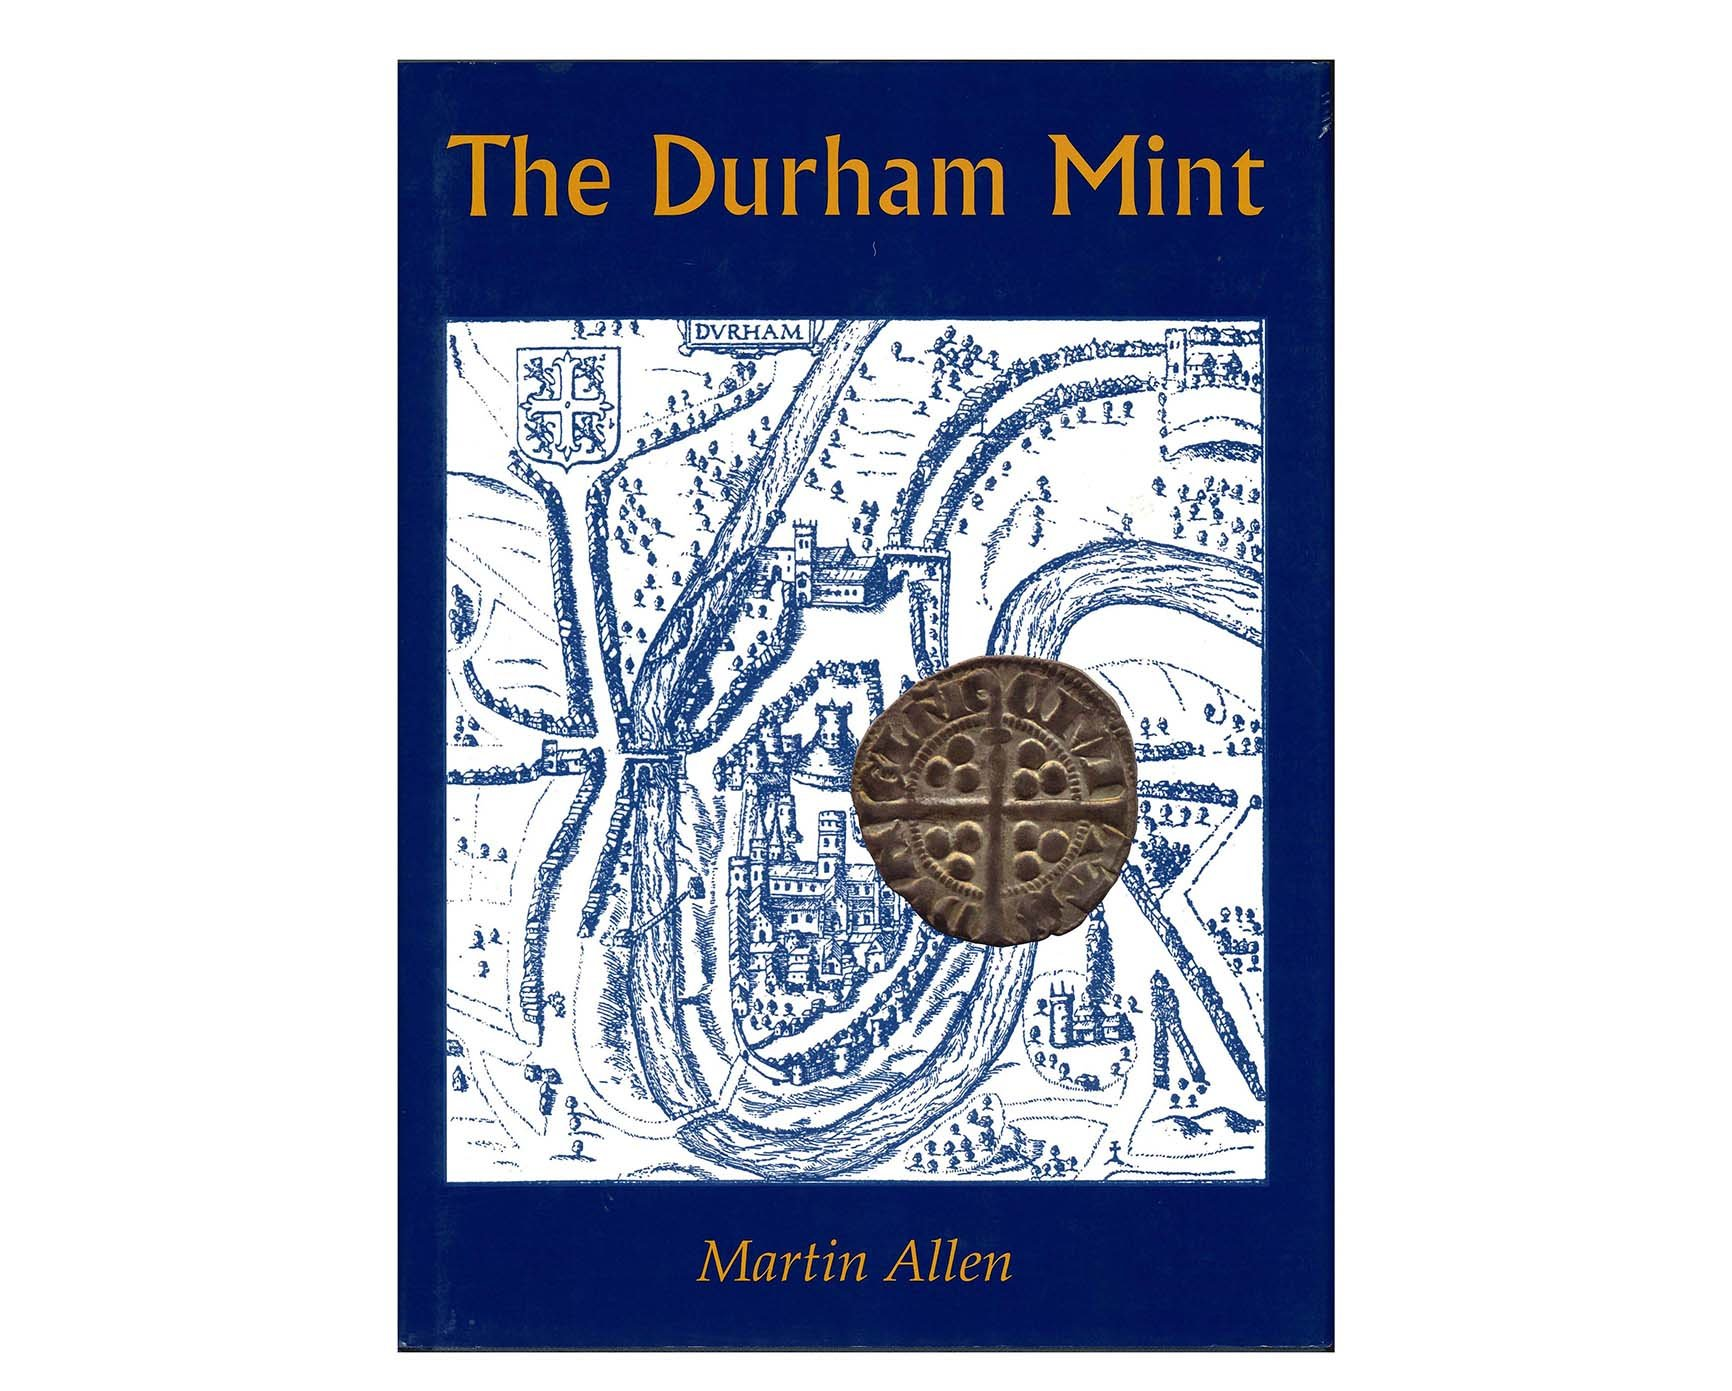 The Durham Mint